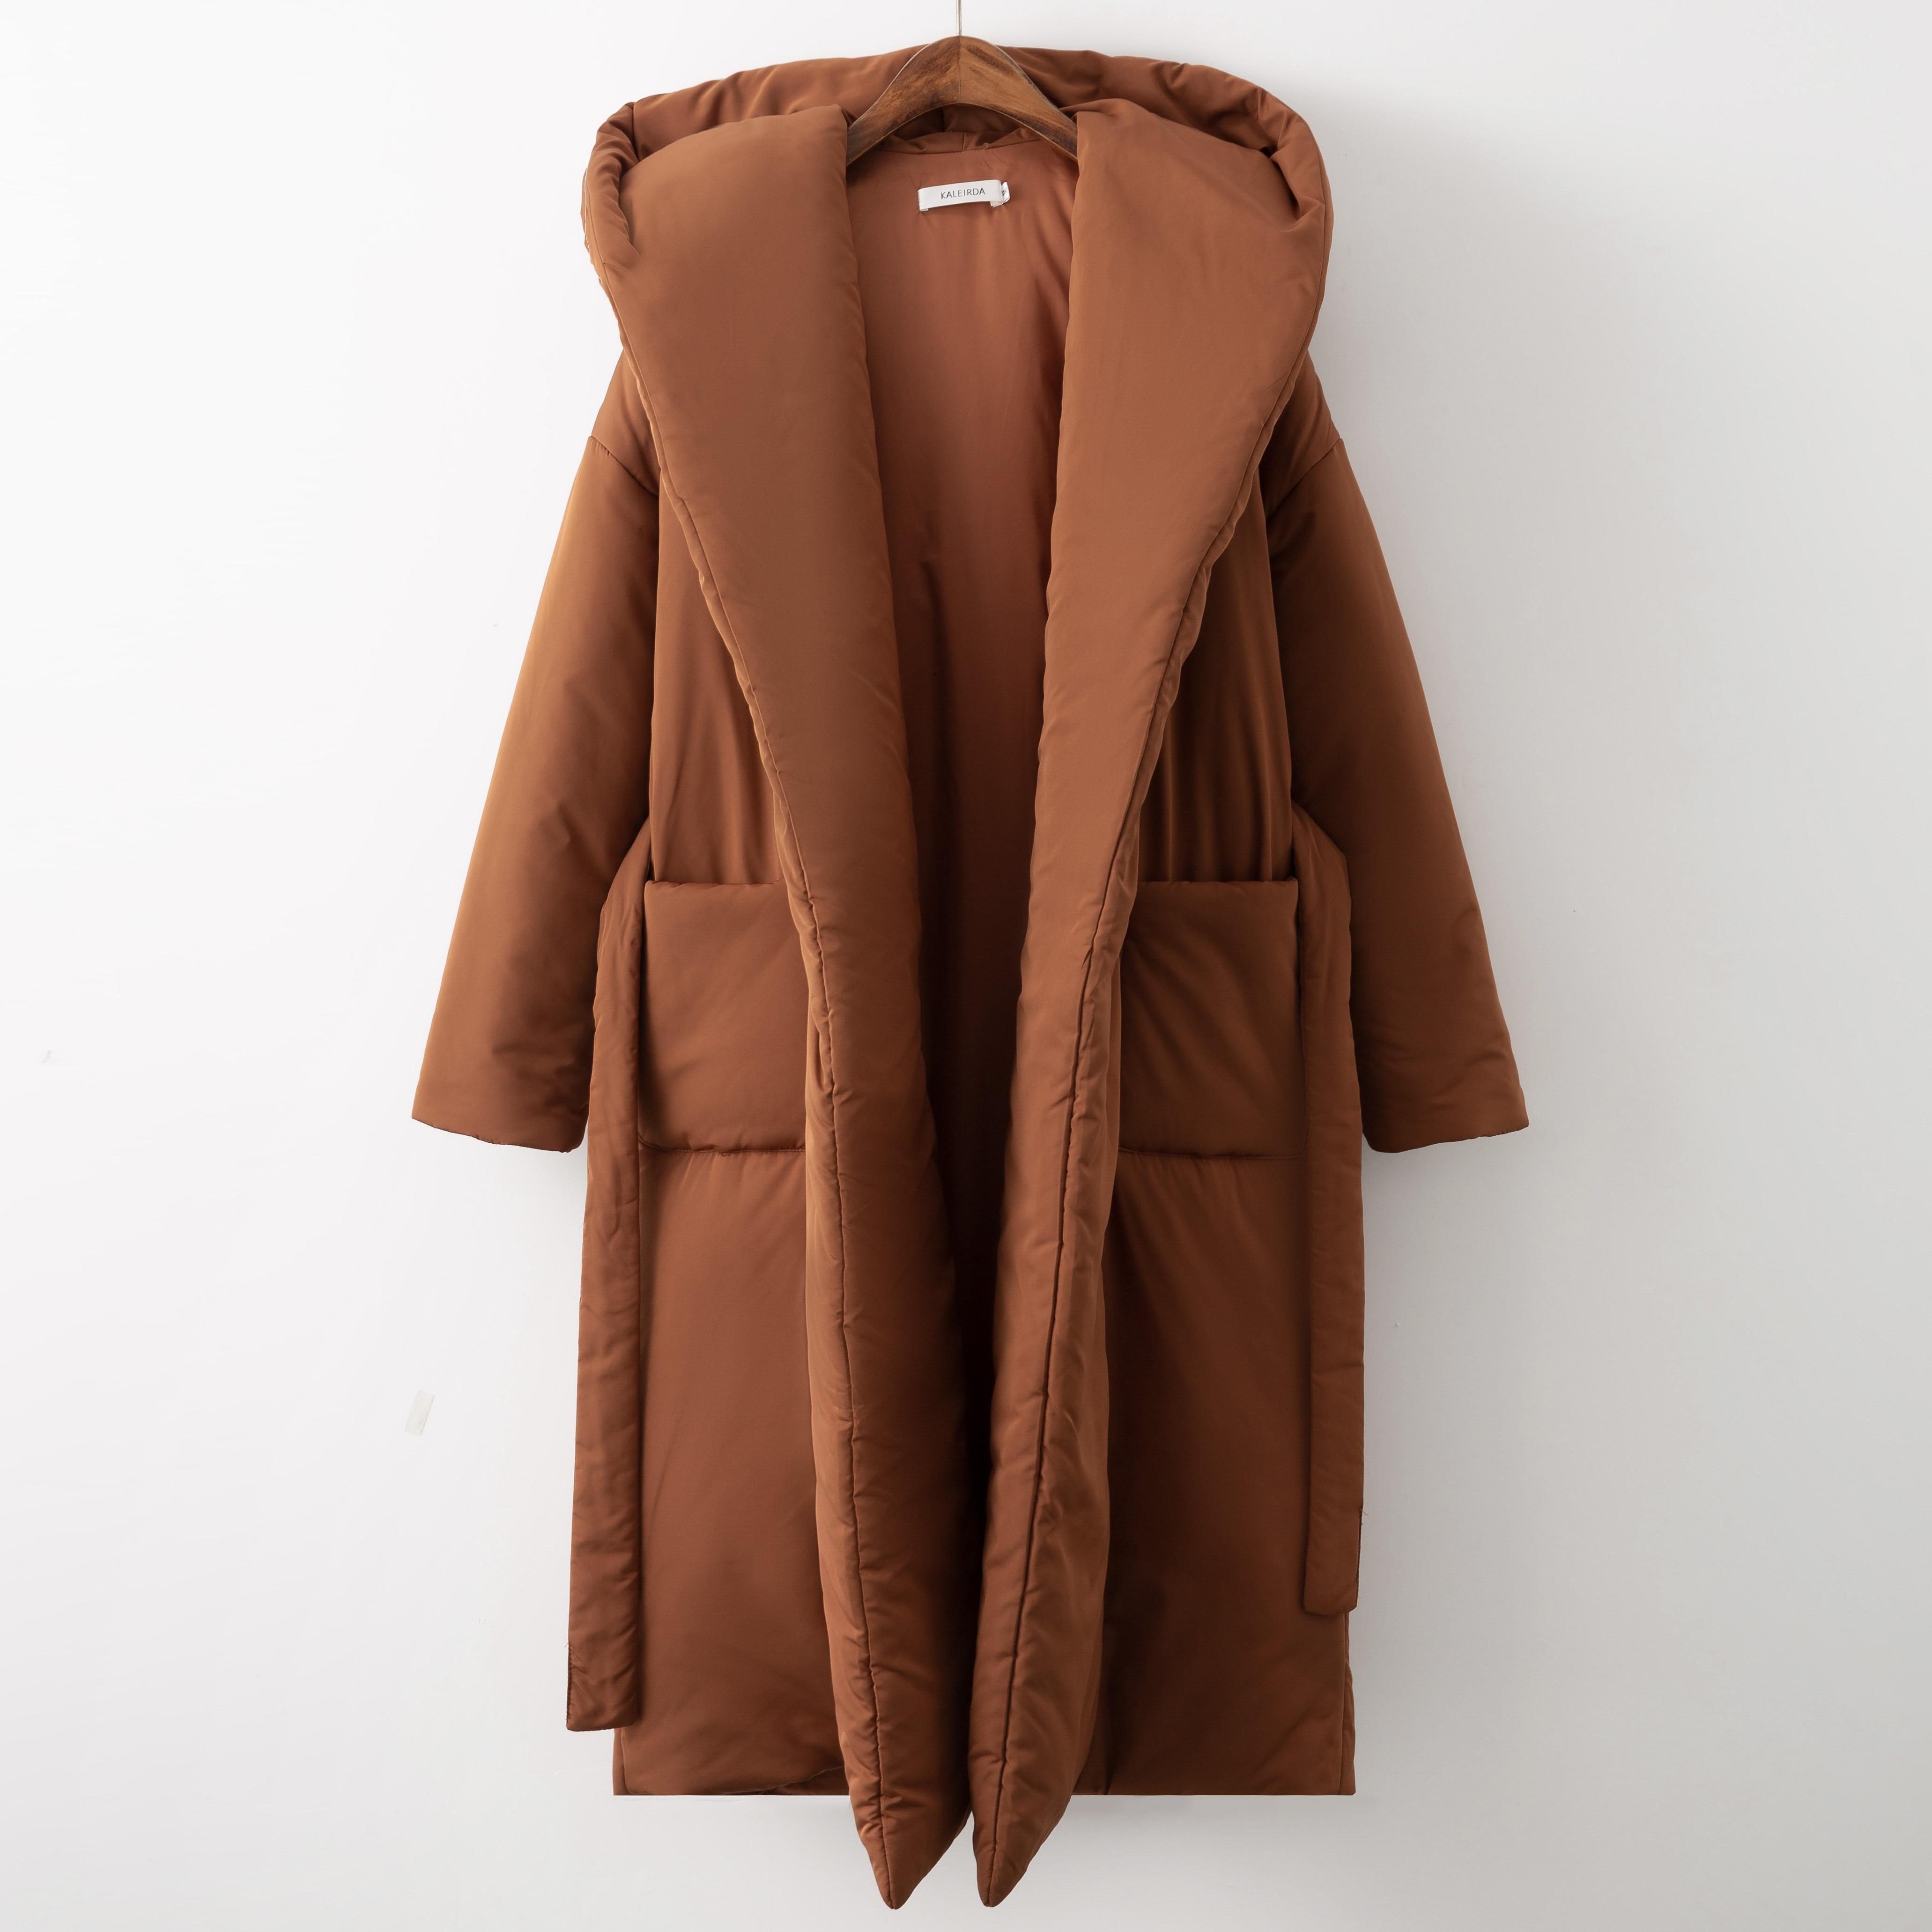 2020 Women Winter Jacket coat Stylish Thick Warm fluff Long Parka Female water proof outerware coat New Hot Parkas  - AliExpress